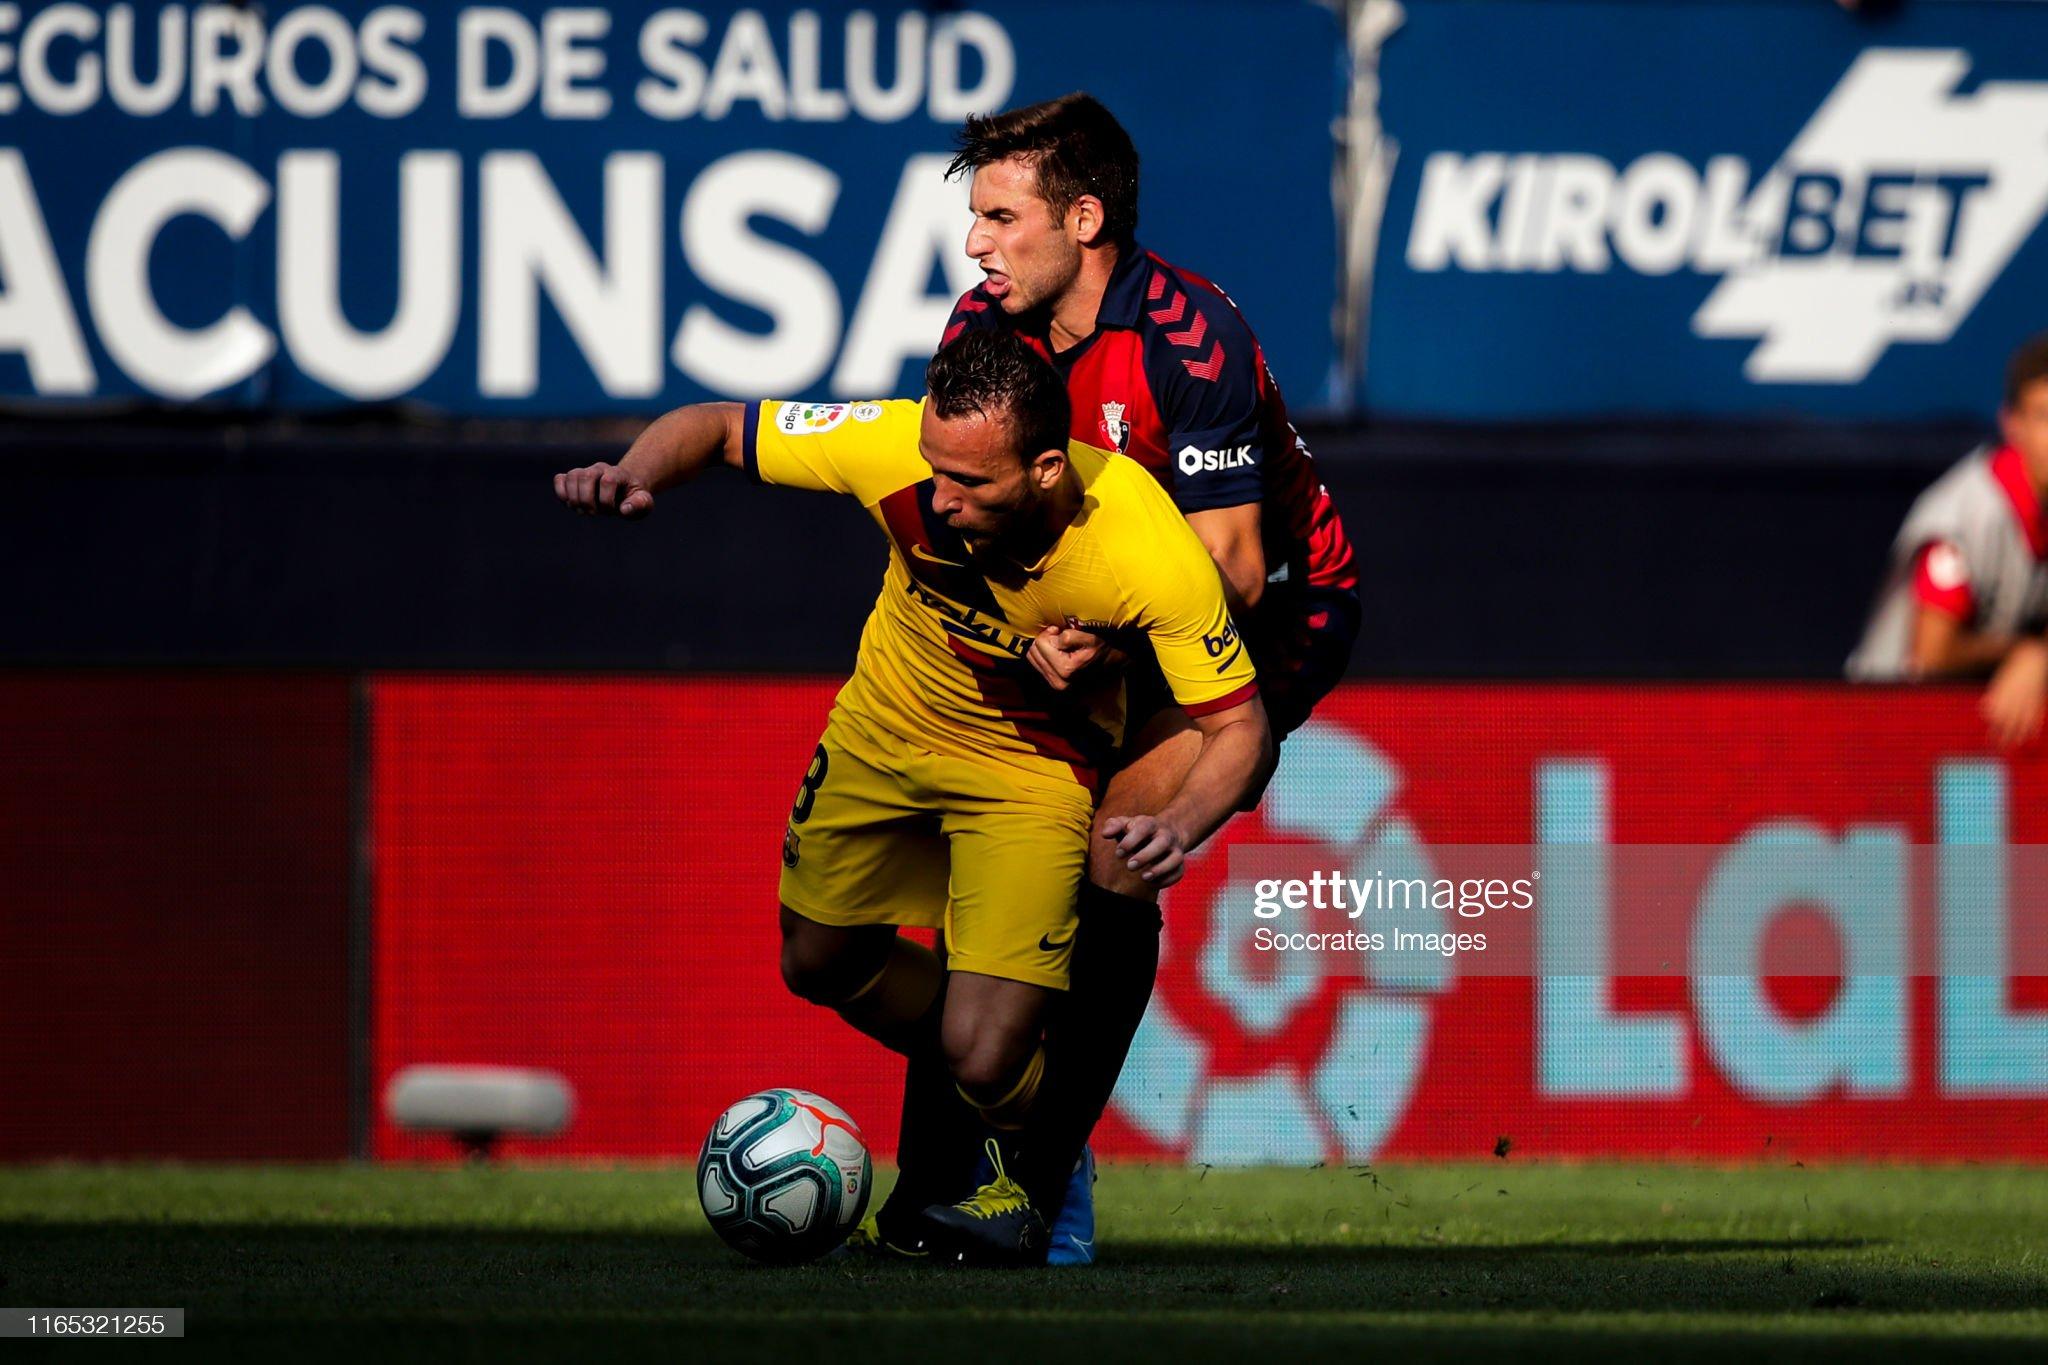 صور مباراة : أوساسونا - برشلونة 2-2 ( 31-08-2019 )  Arthur-of-fc-barcelona-nacho-vidal-of-ca-osasuna-during-the-la-liga-picture-id1165321255?s=2048x2048